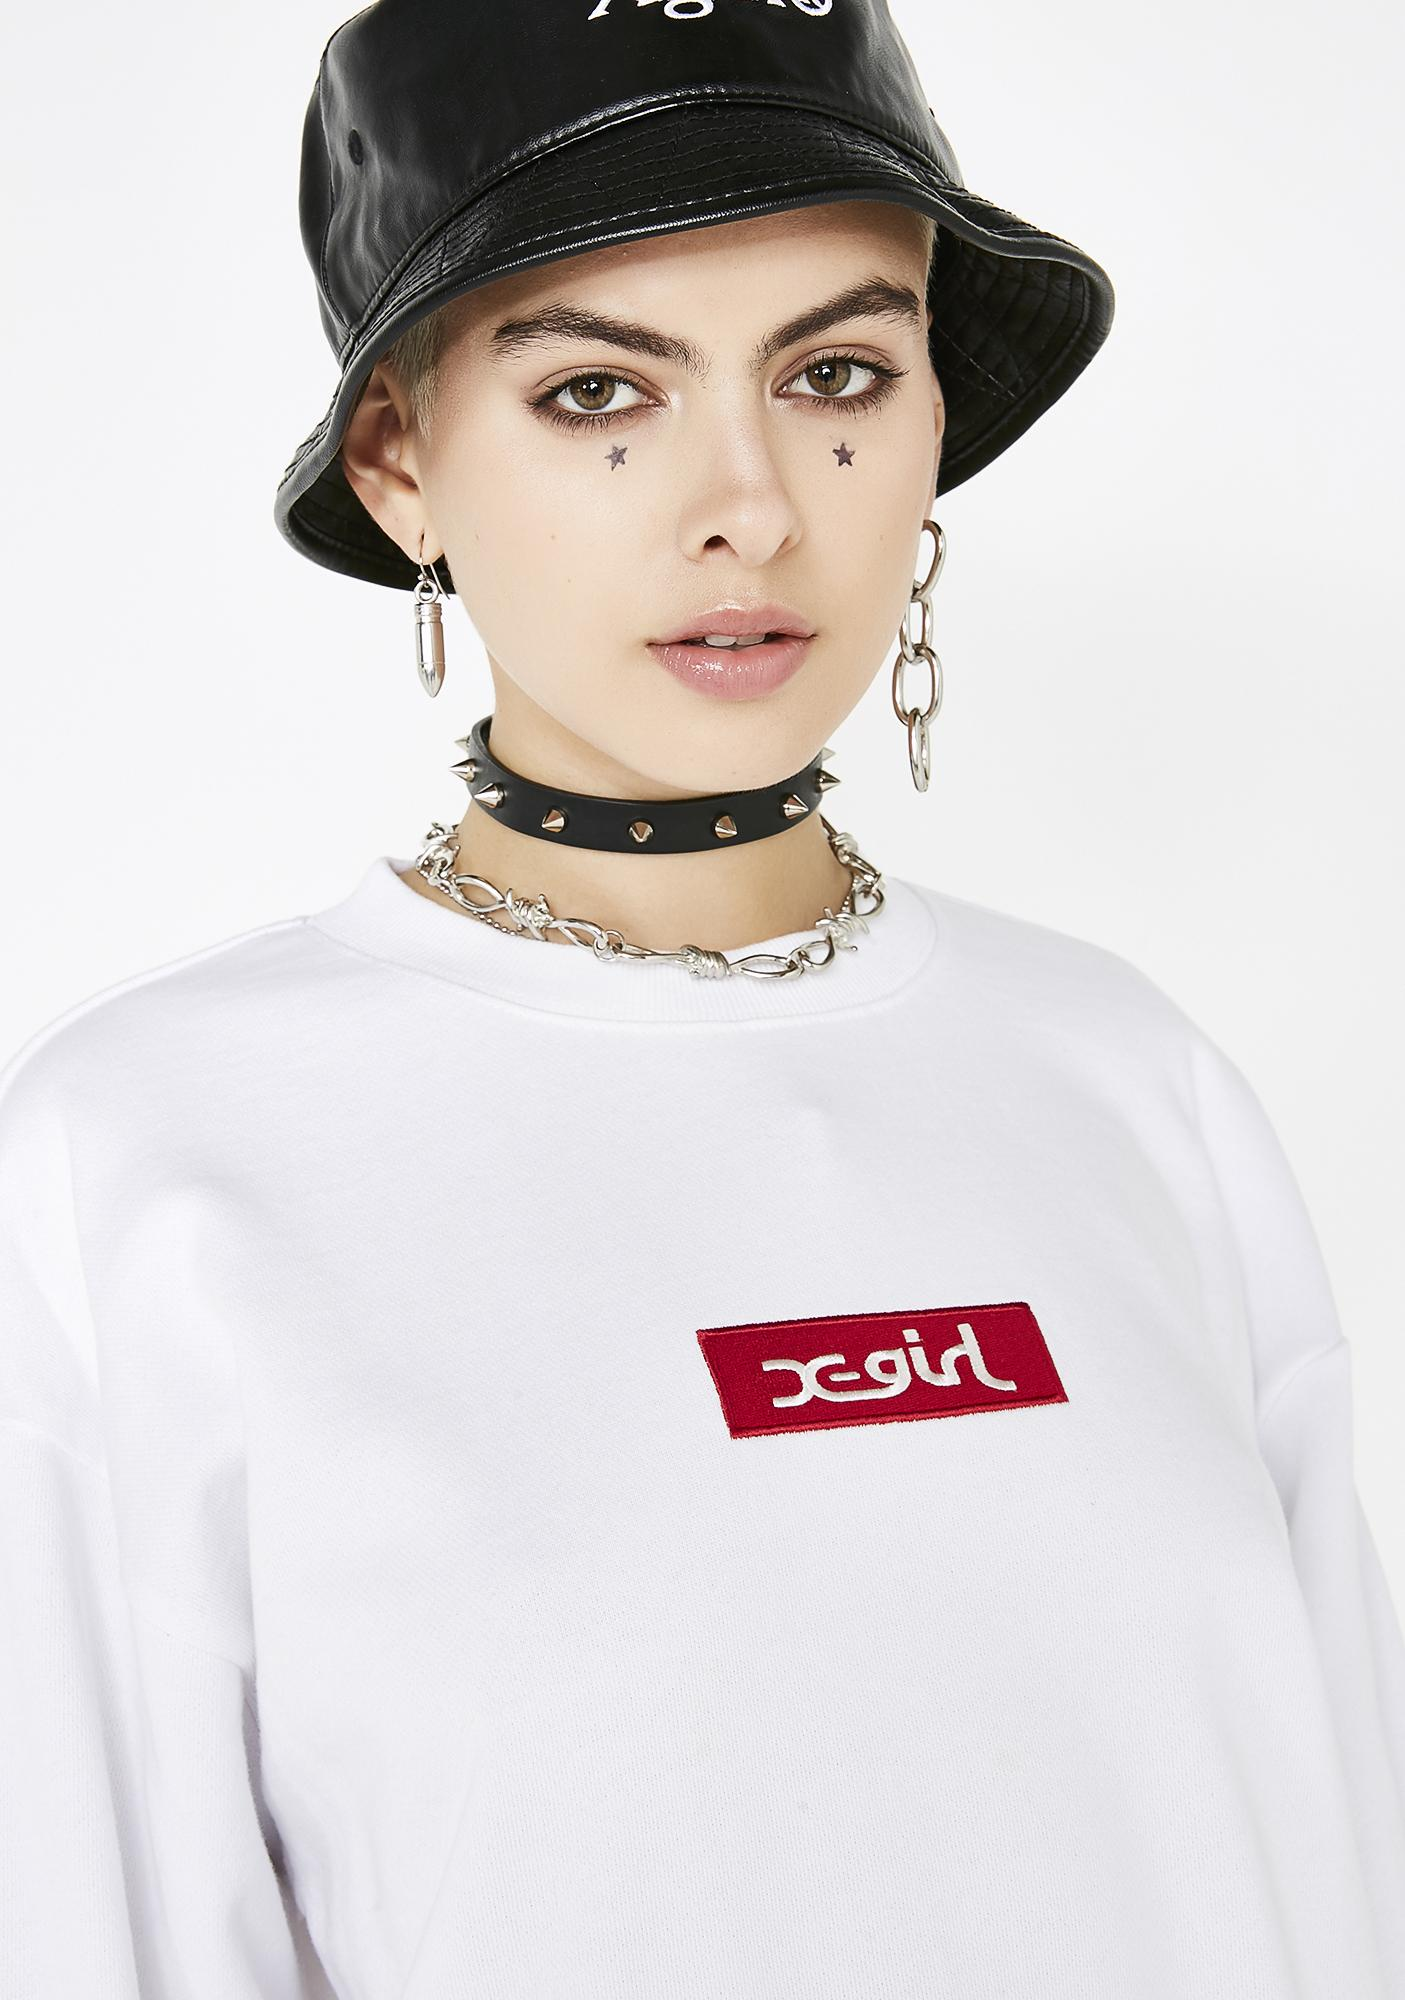 x-Girl Box Logo Crew Sweatshirt